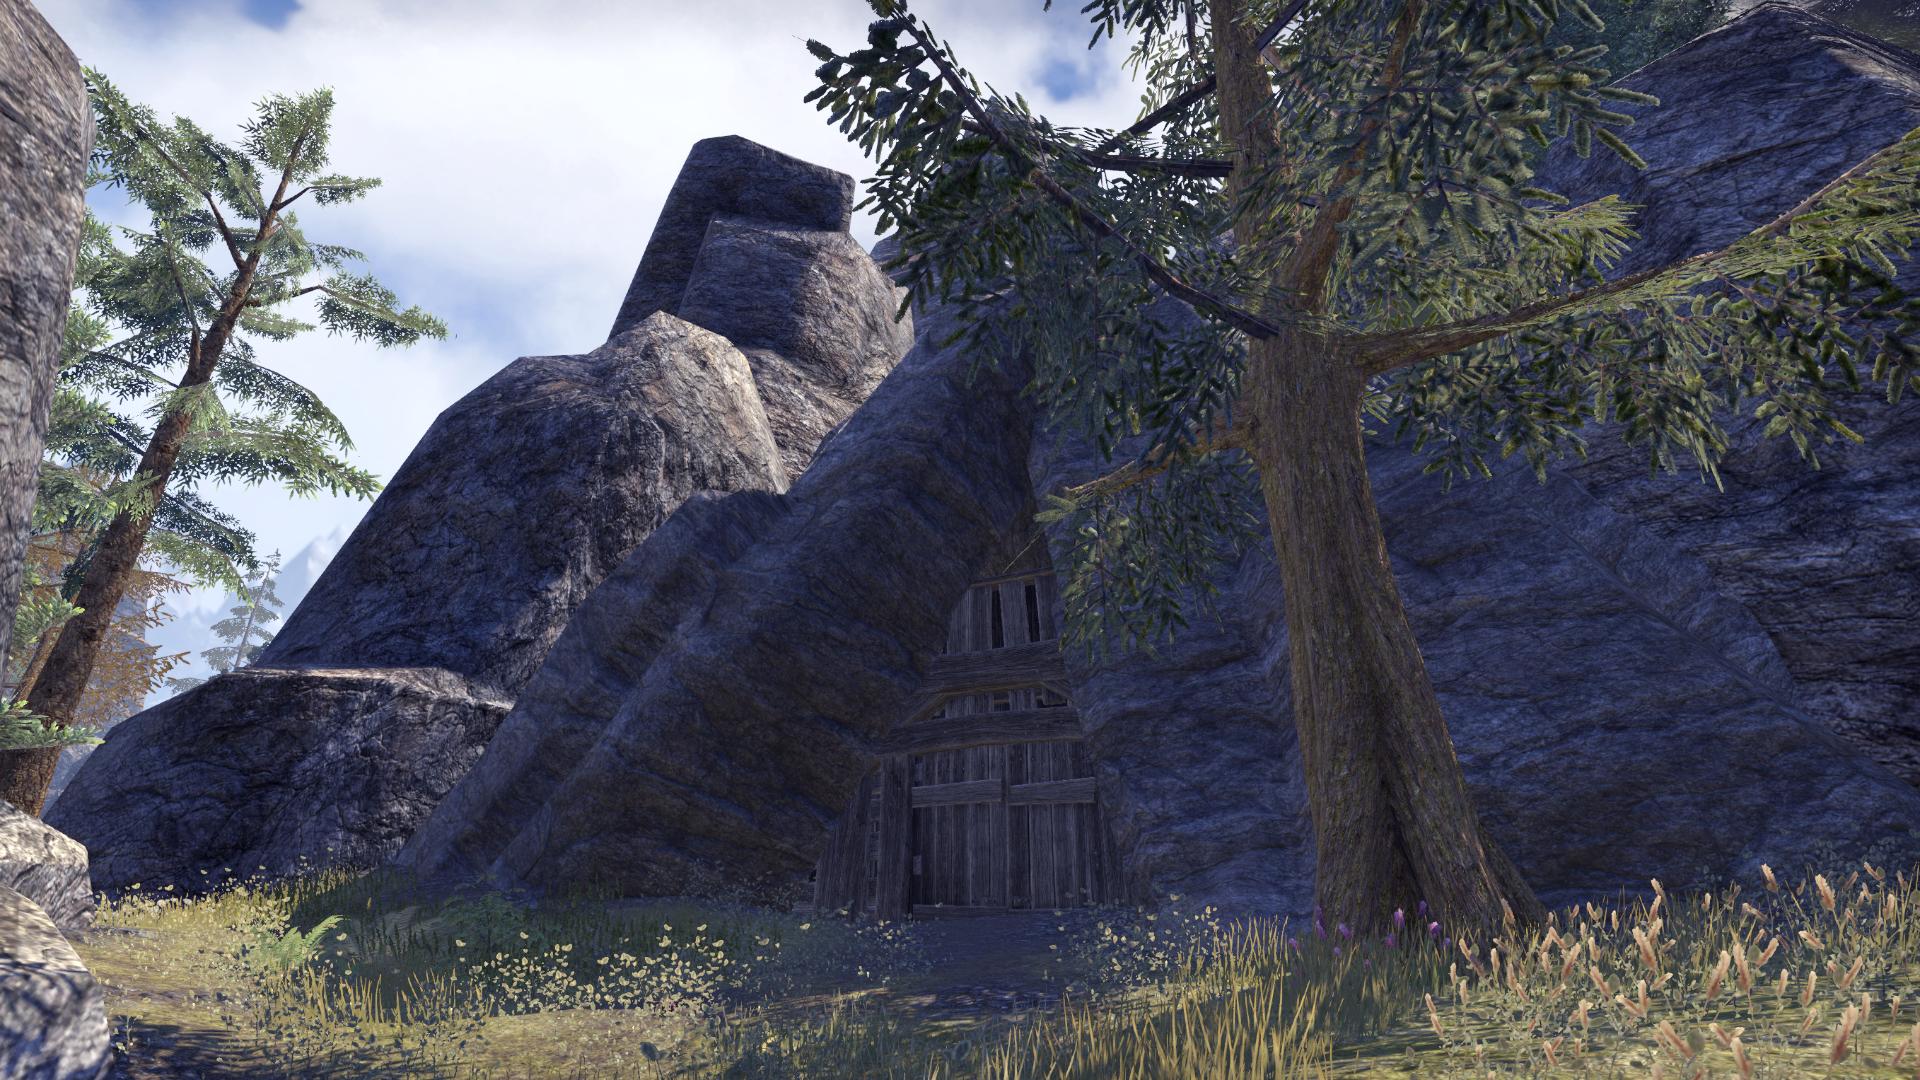 Stormcrag Crypt